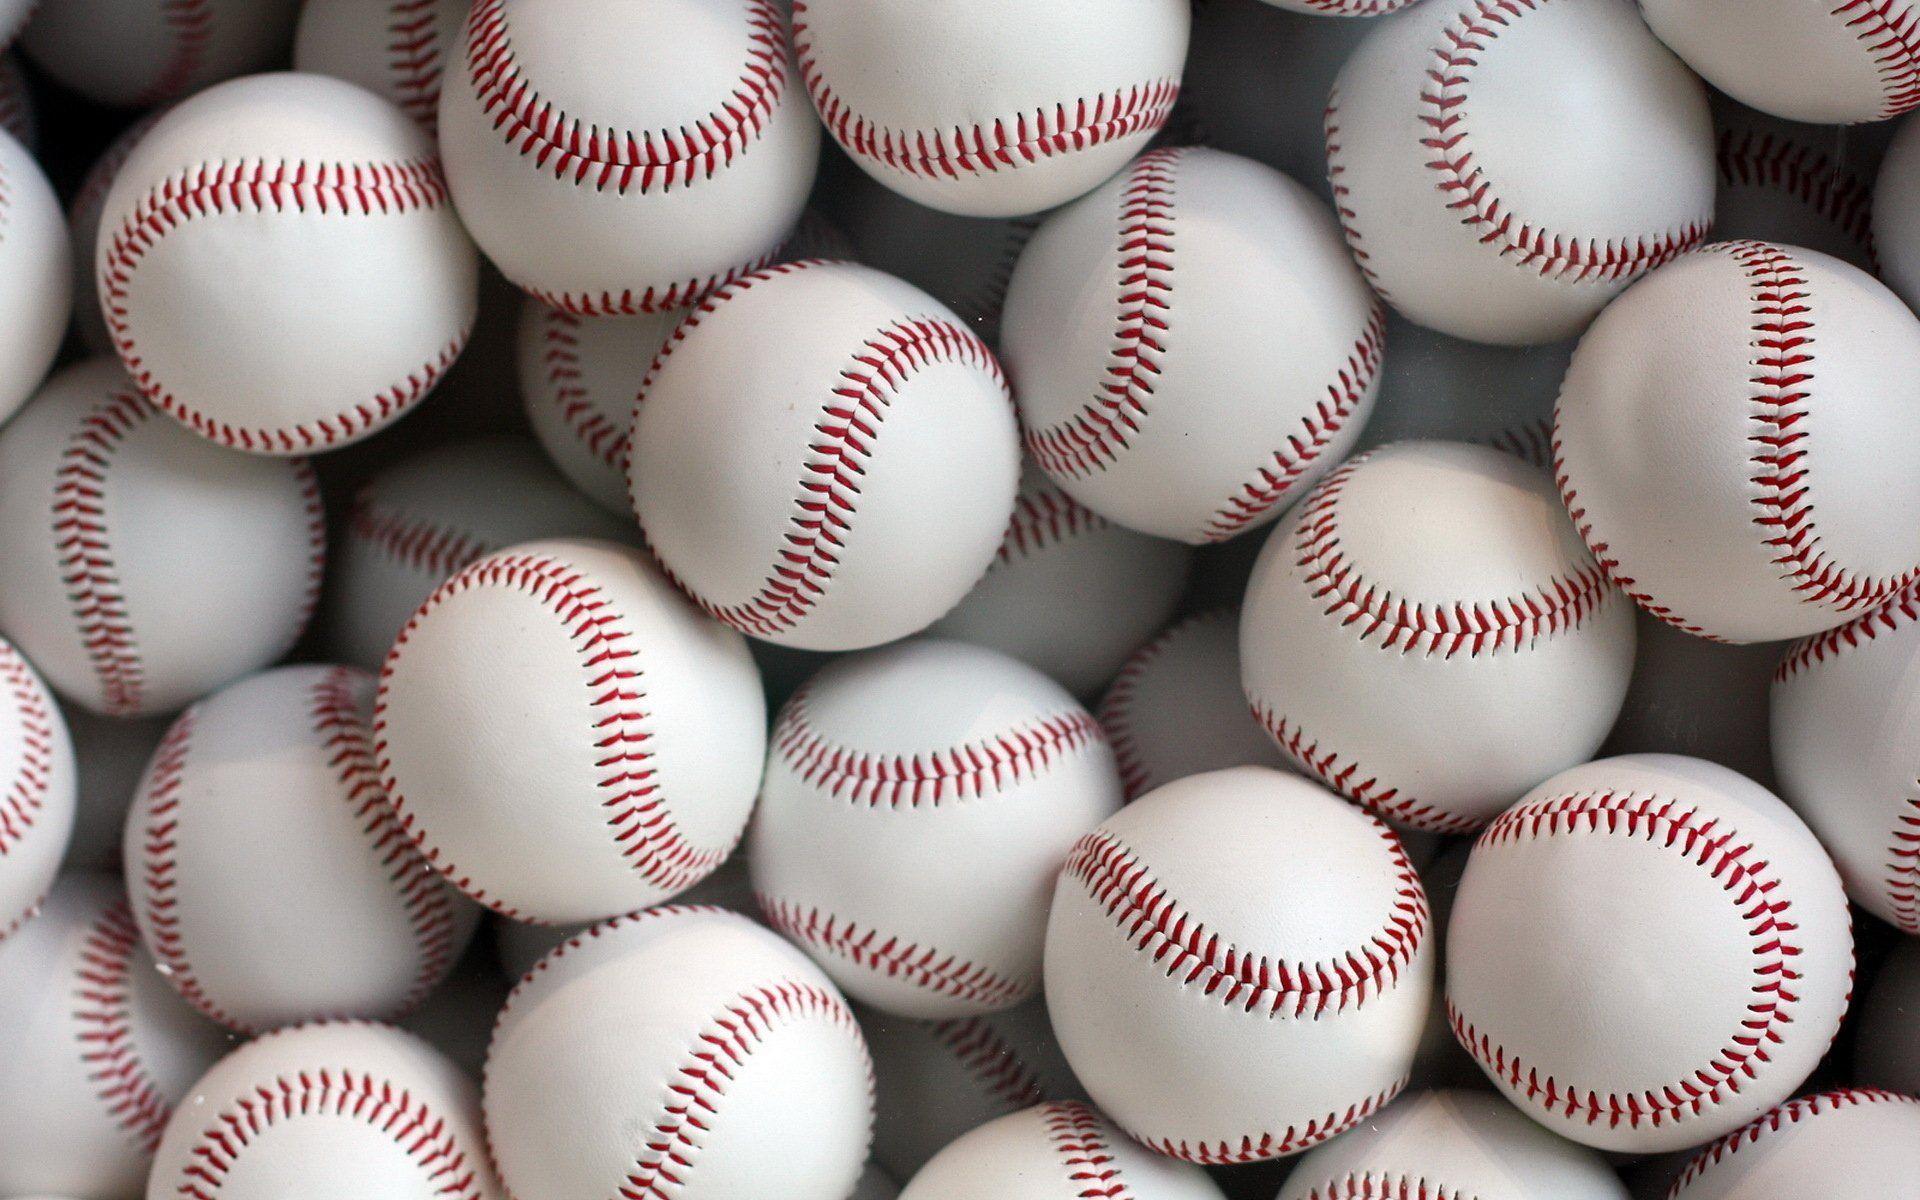 Baseball Wallpapers Top Free Baseball Backgrounds Wallpaperaccess